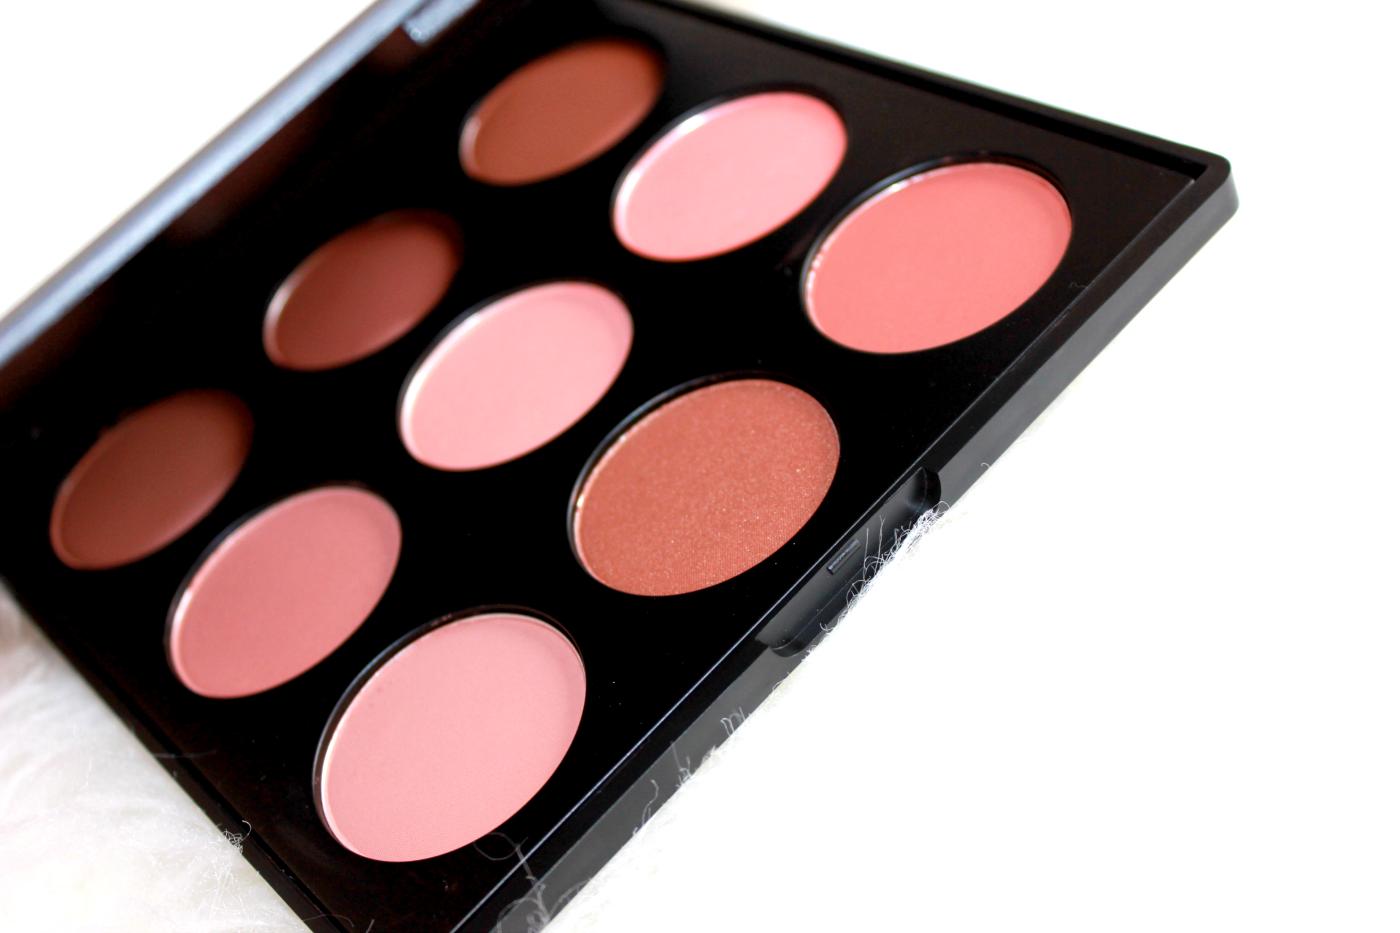 Morphe 9n The Naturally Blushed Blush Palette Eline Blaise